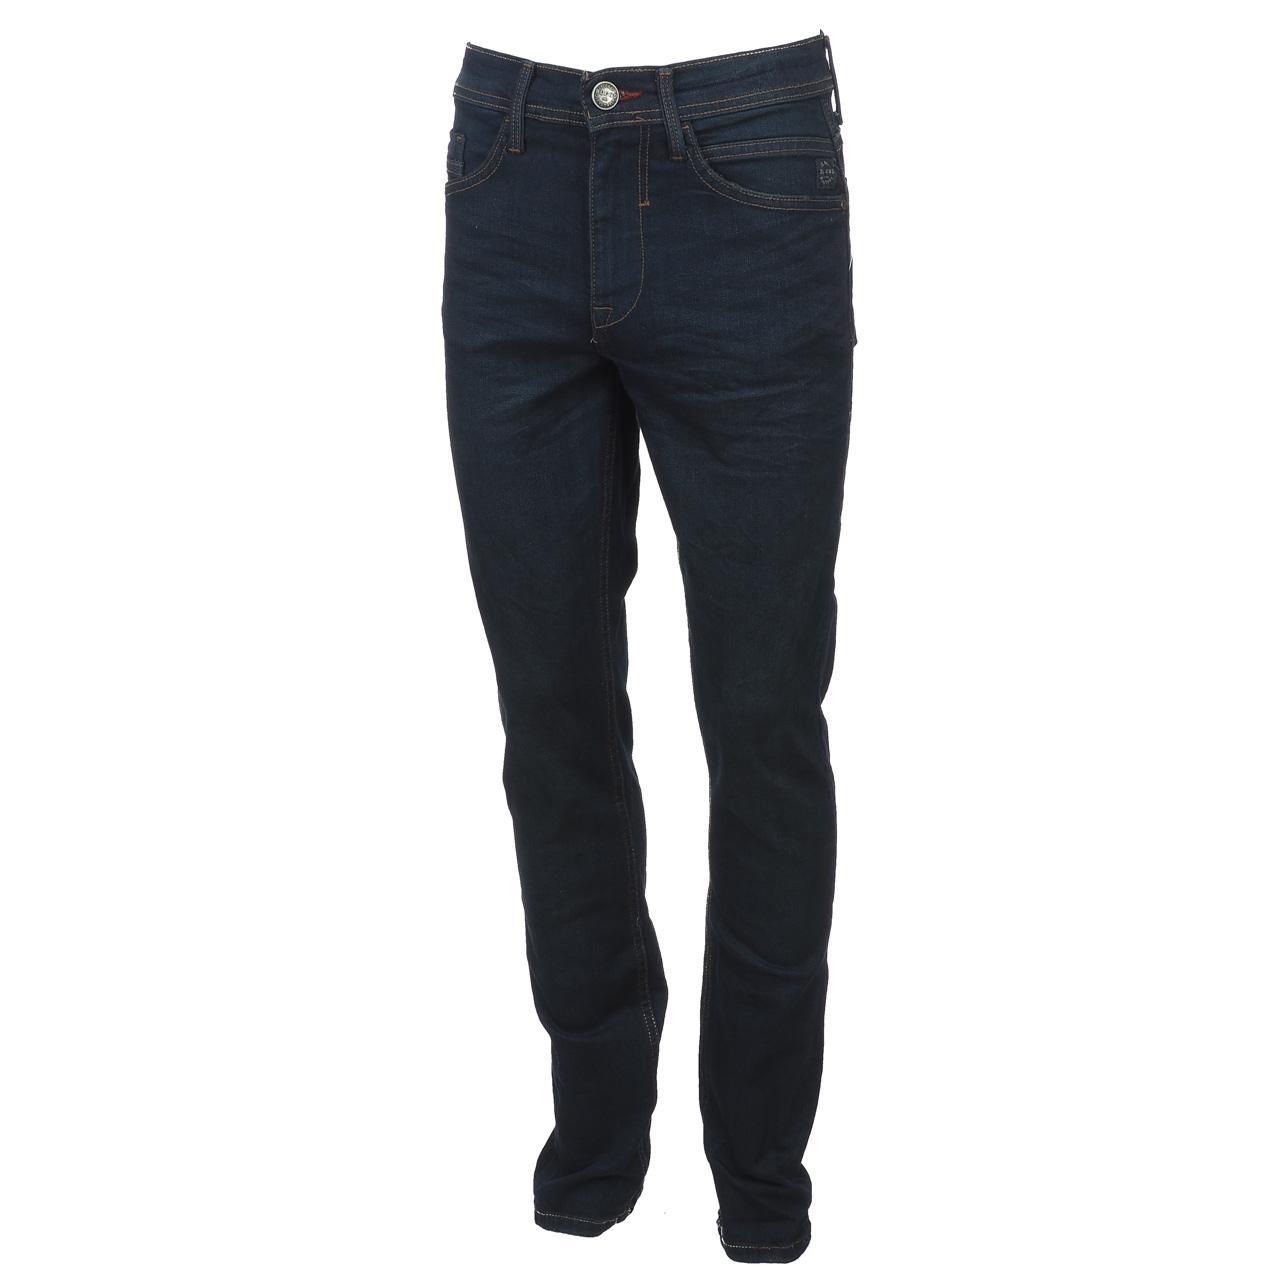 Jeans-Pants-Slim-Blend-Twister-34-Dk-Blue-Blue-Jeans-10961-New